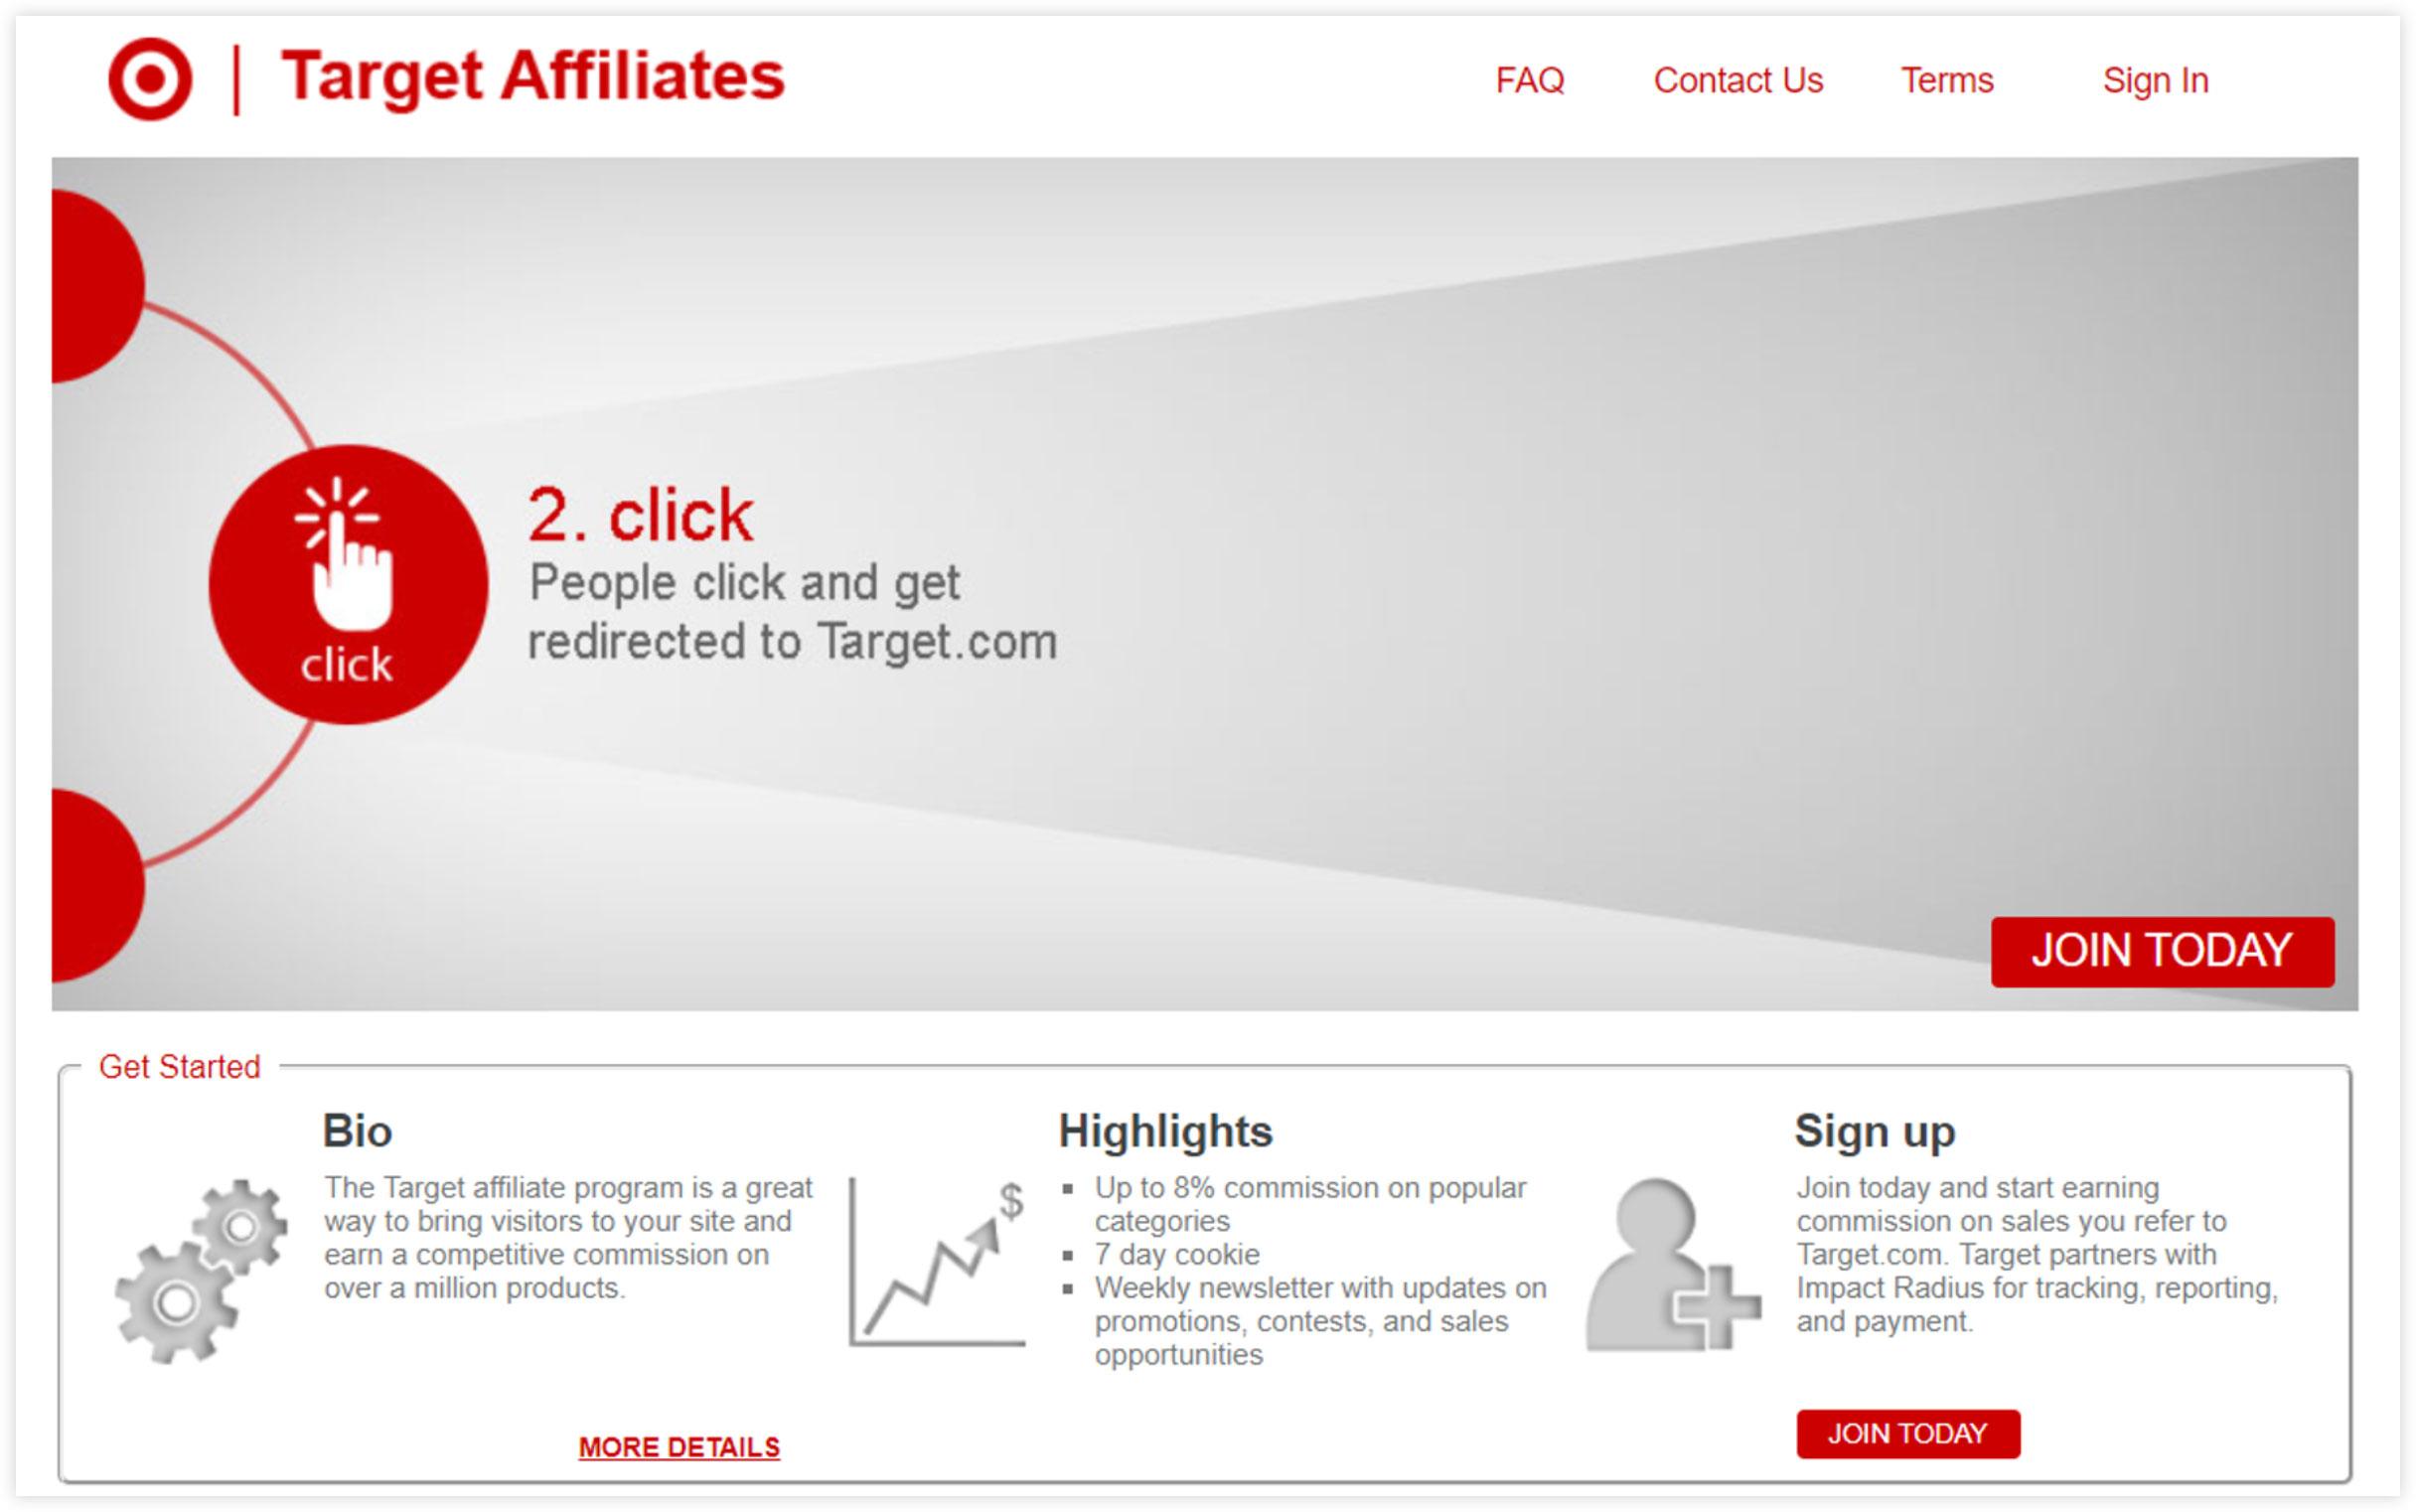 Affiliate Marketplace - Target Affiliates